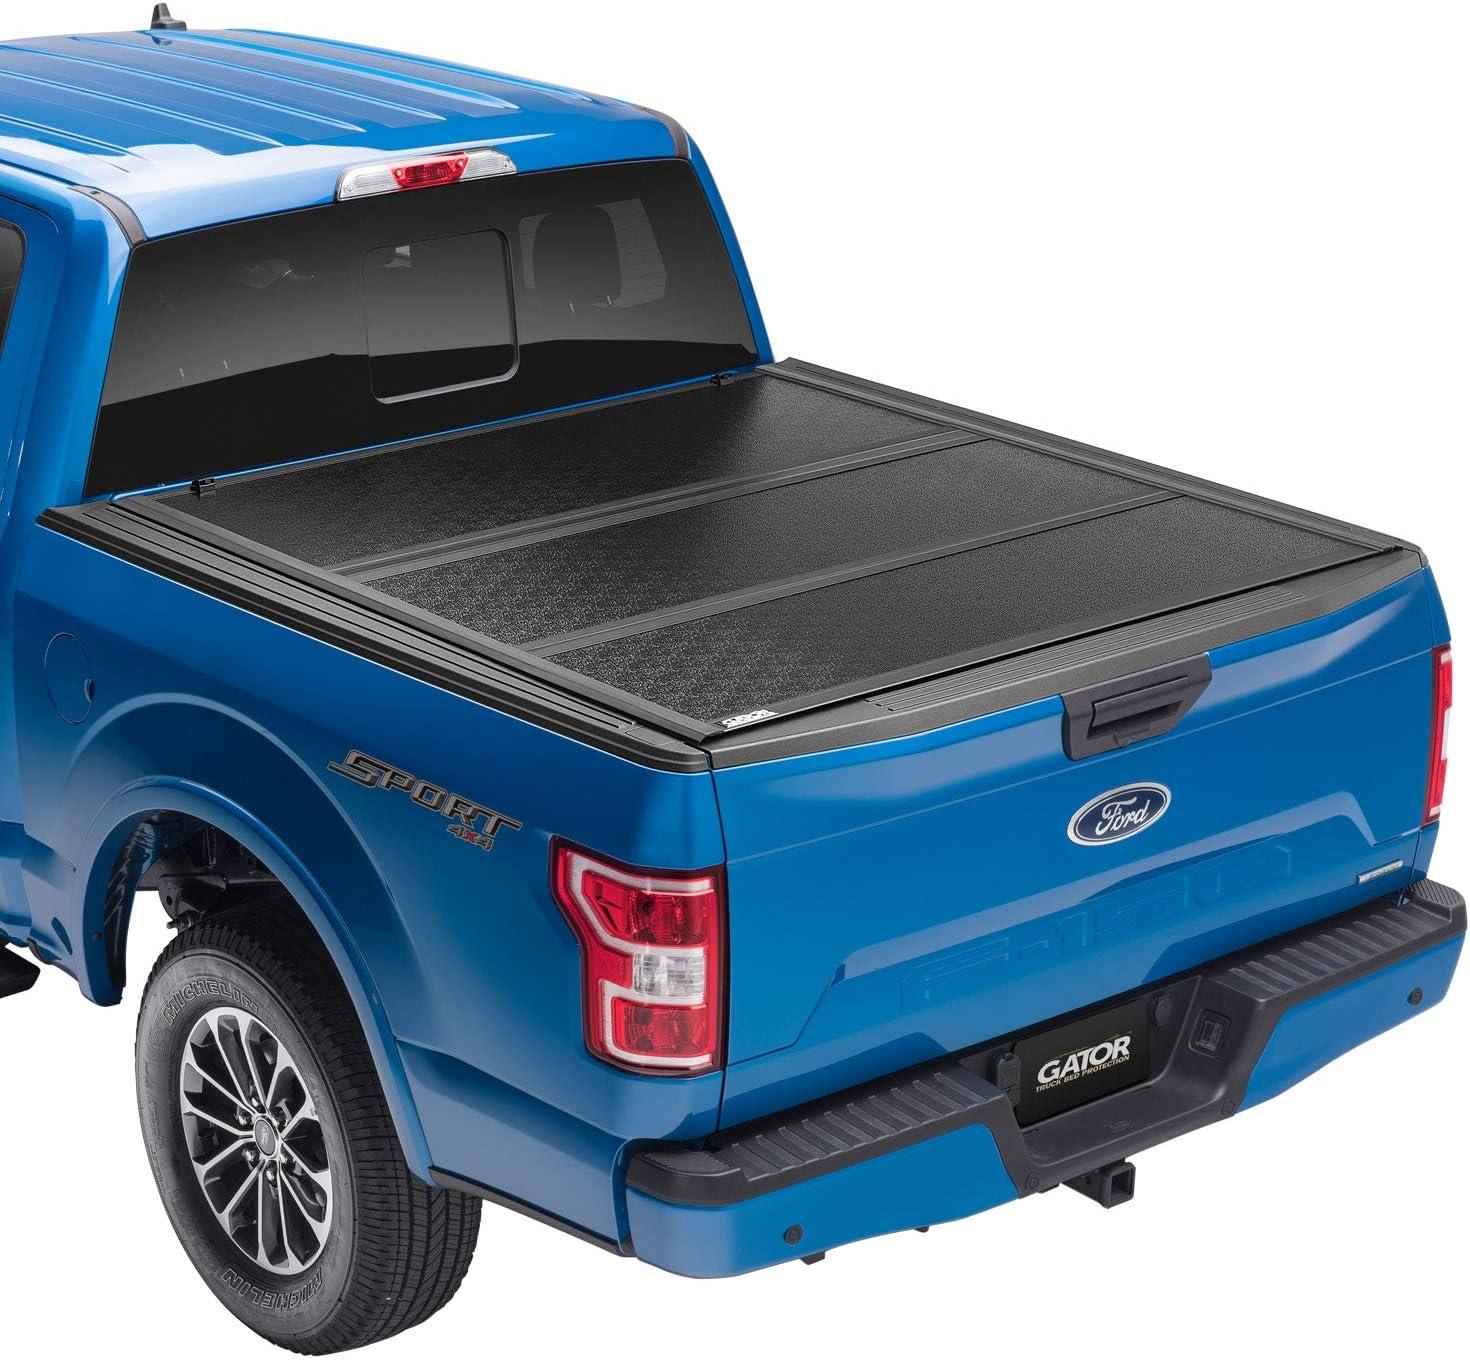 Gator EFX Hard Tri-Fold Truck Bed Tonneau Cover | GC24029 | Fits 2021 Ford F-150 5' 7